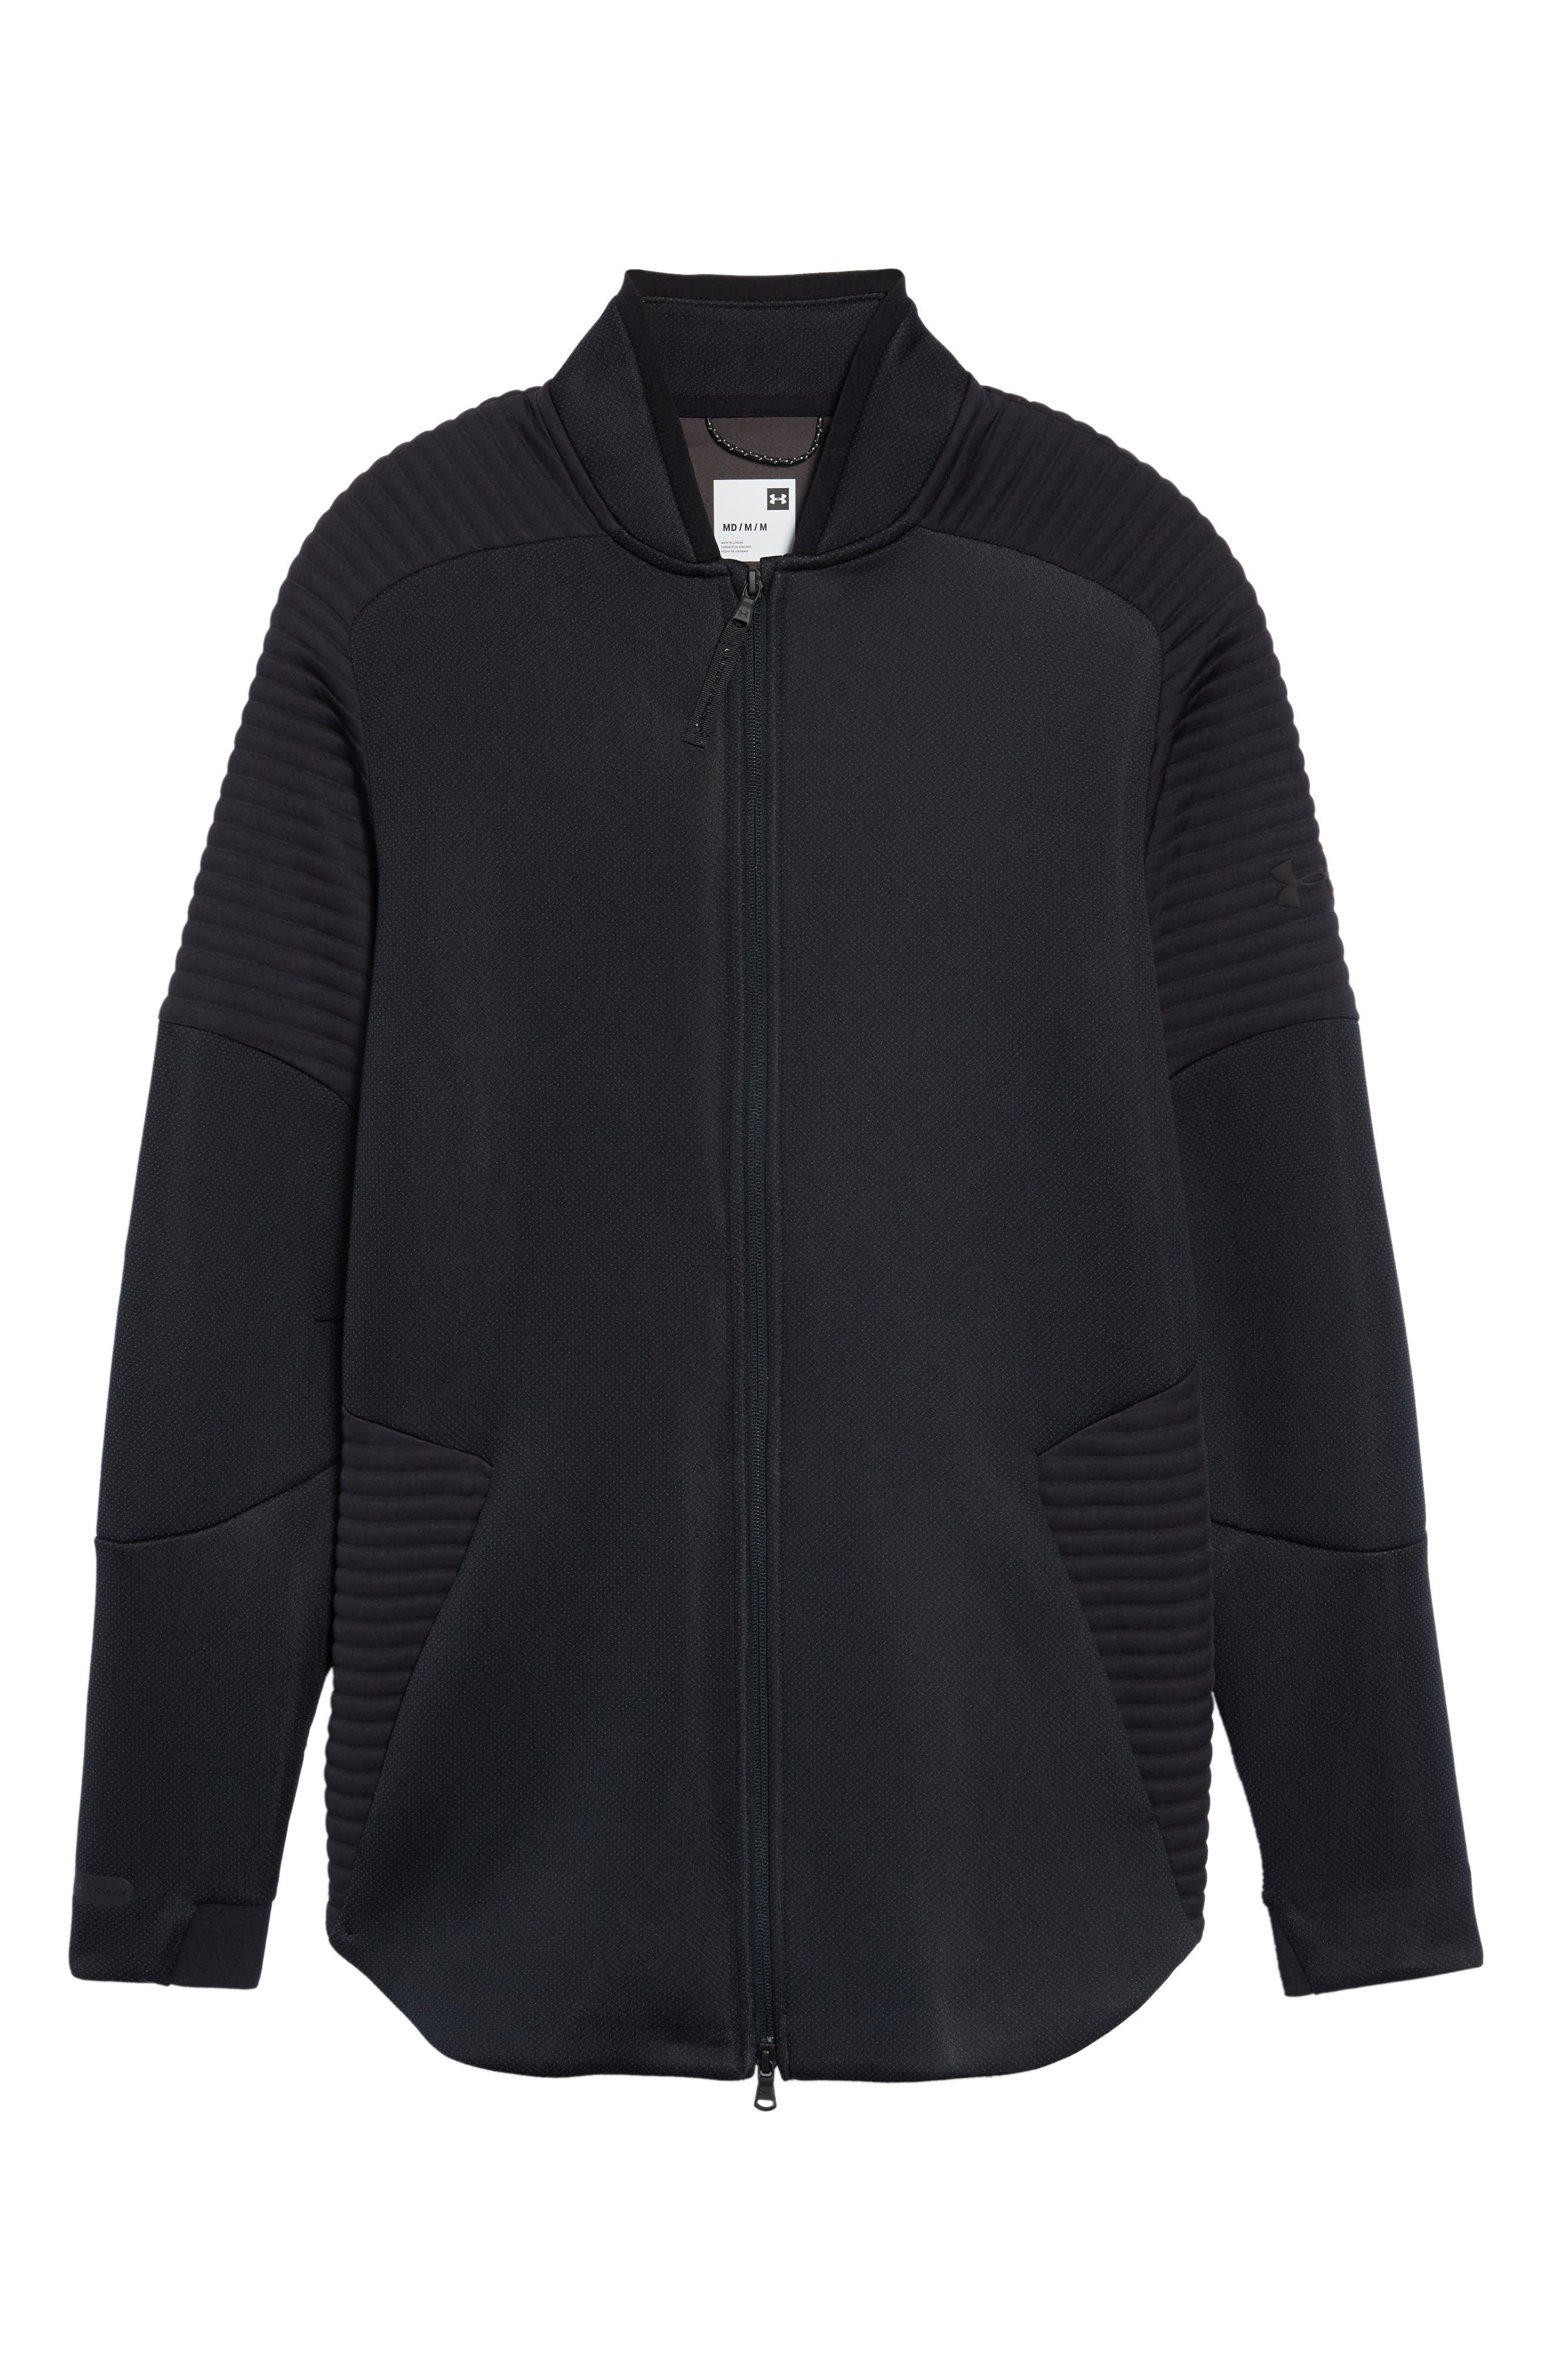 Unstoppable /MOVE Jacket,                             Alternate thumbnail 7, color,                             BLACK/ CHARCOAL/ BLACK